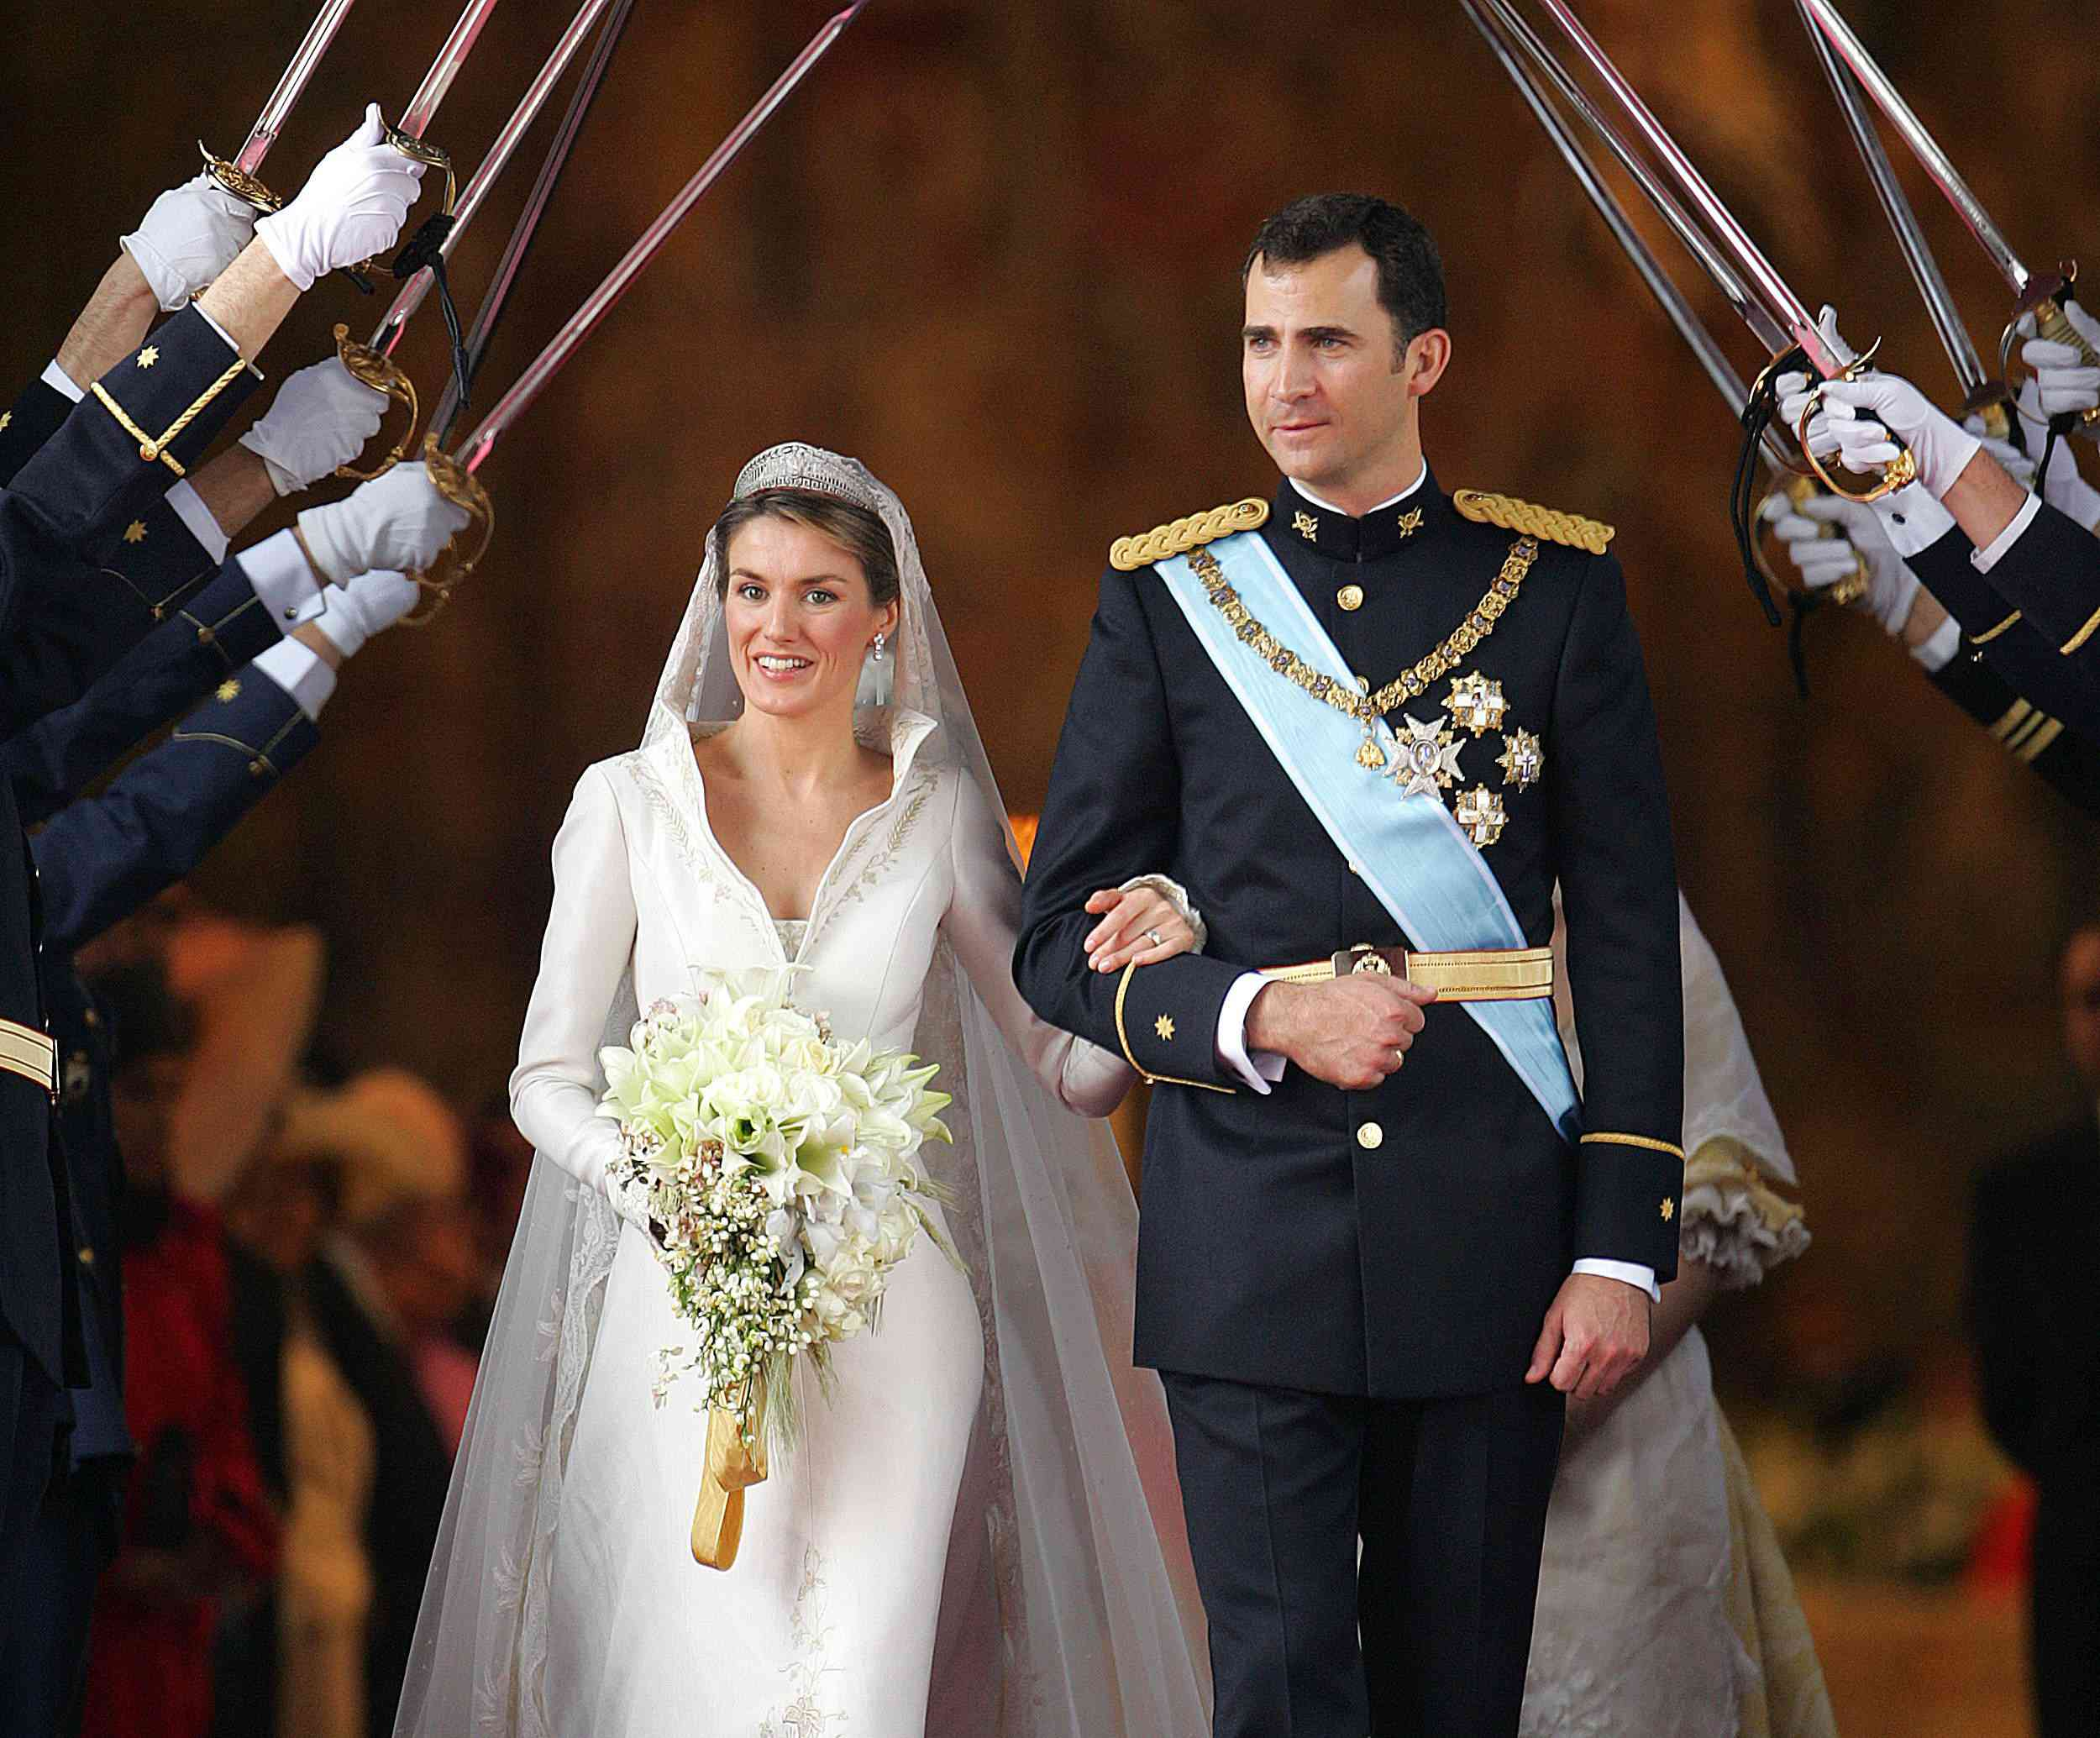 Princess of Asturias Letizia Ortiz and Spanish Crown Felipe of Bourbon on their wedding day